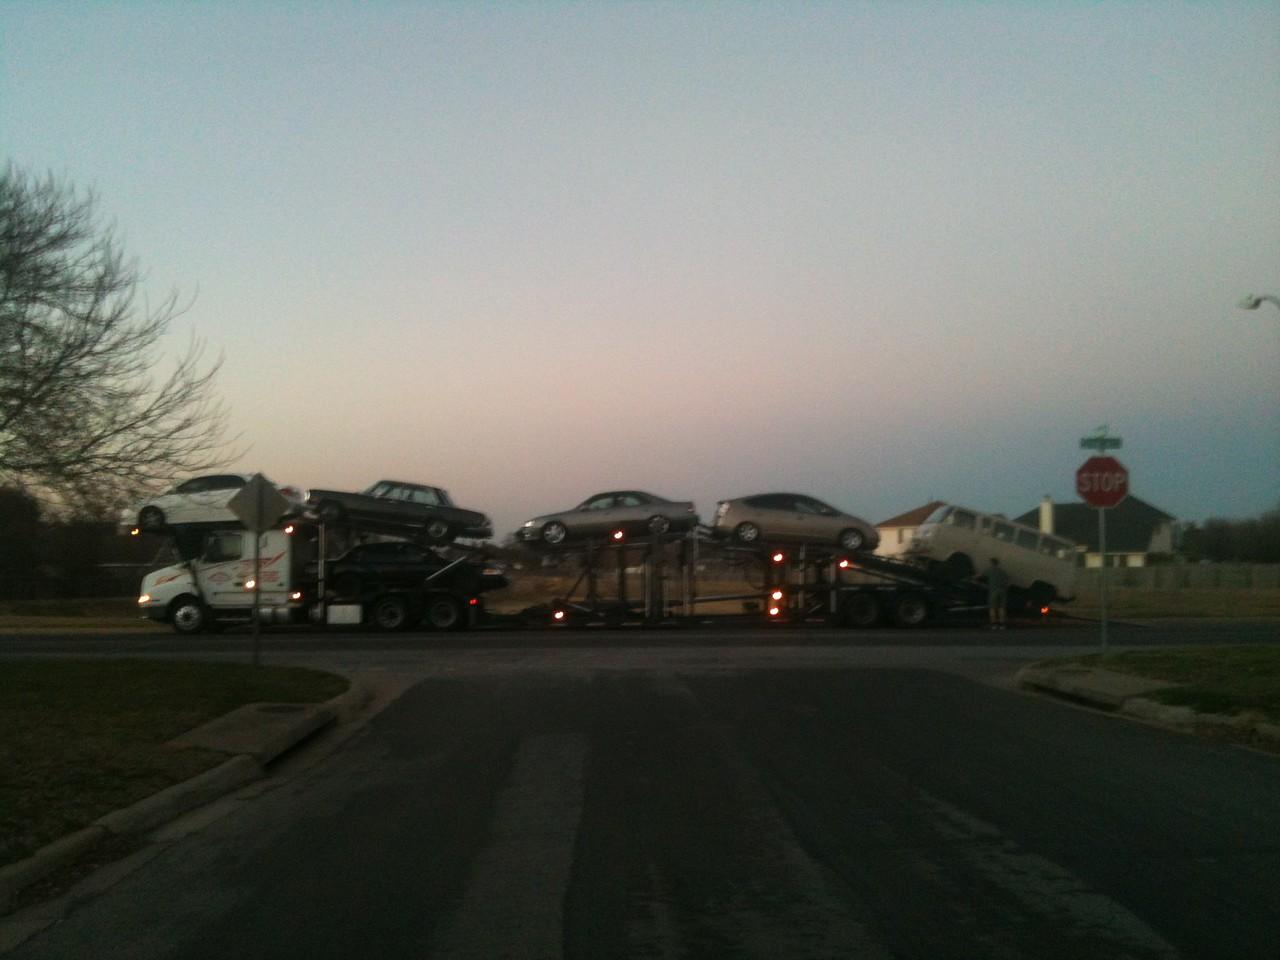 Arrival from AZ